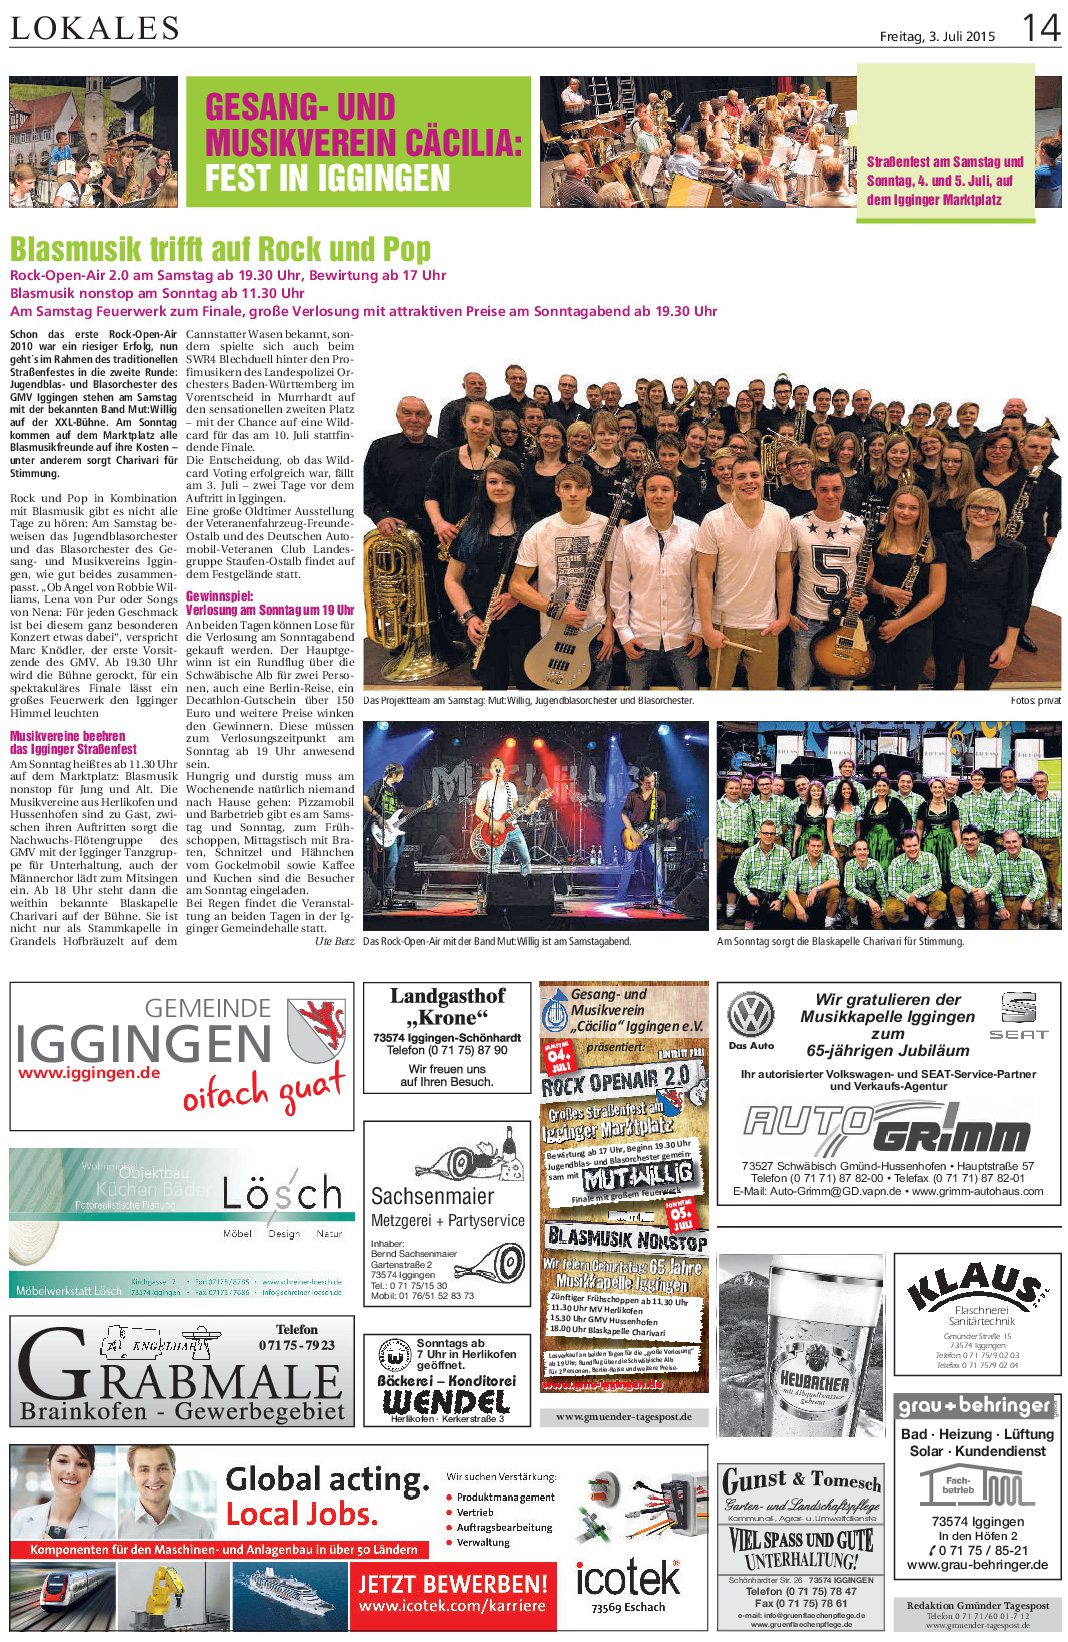 Gmünder Tagespost Kollektiv vom 3.7. Strassenfest 2015